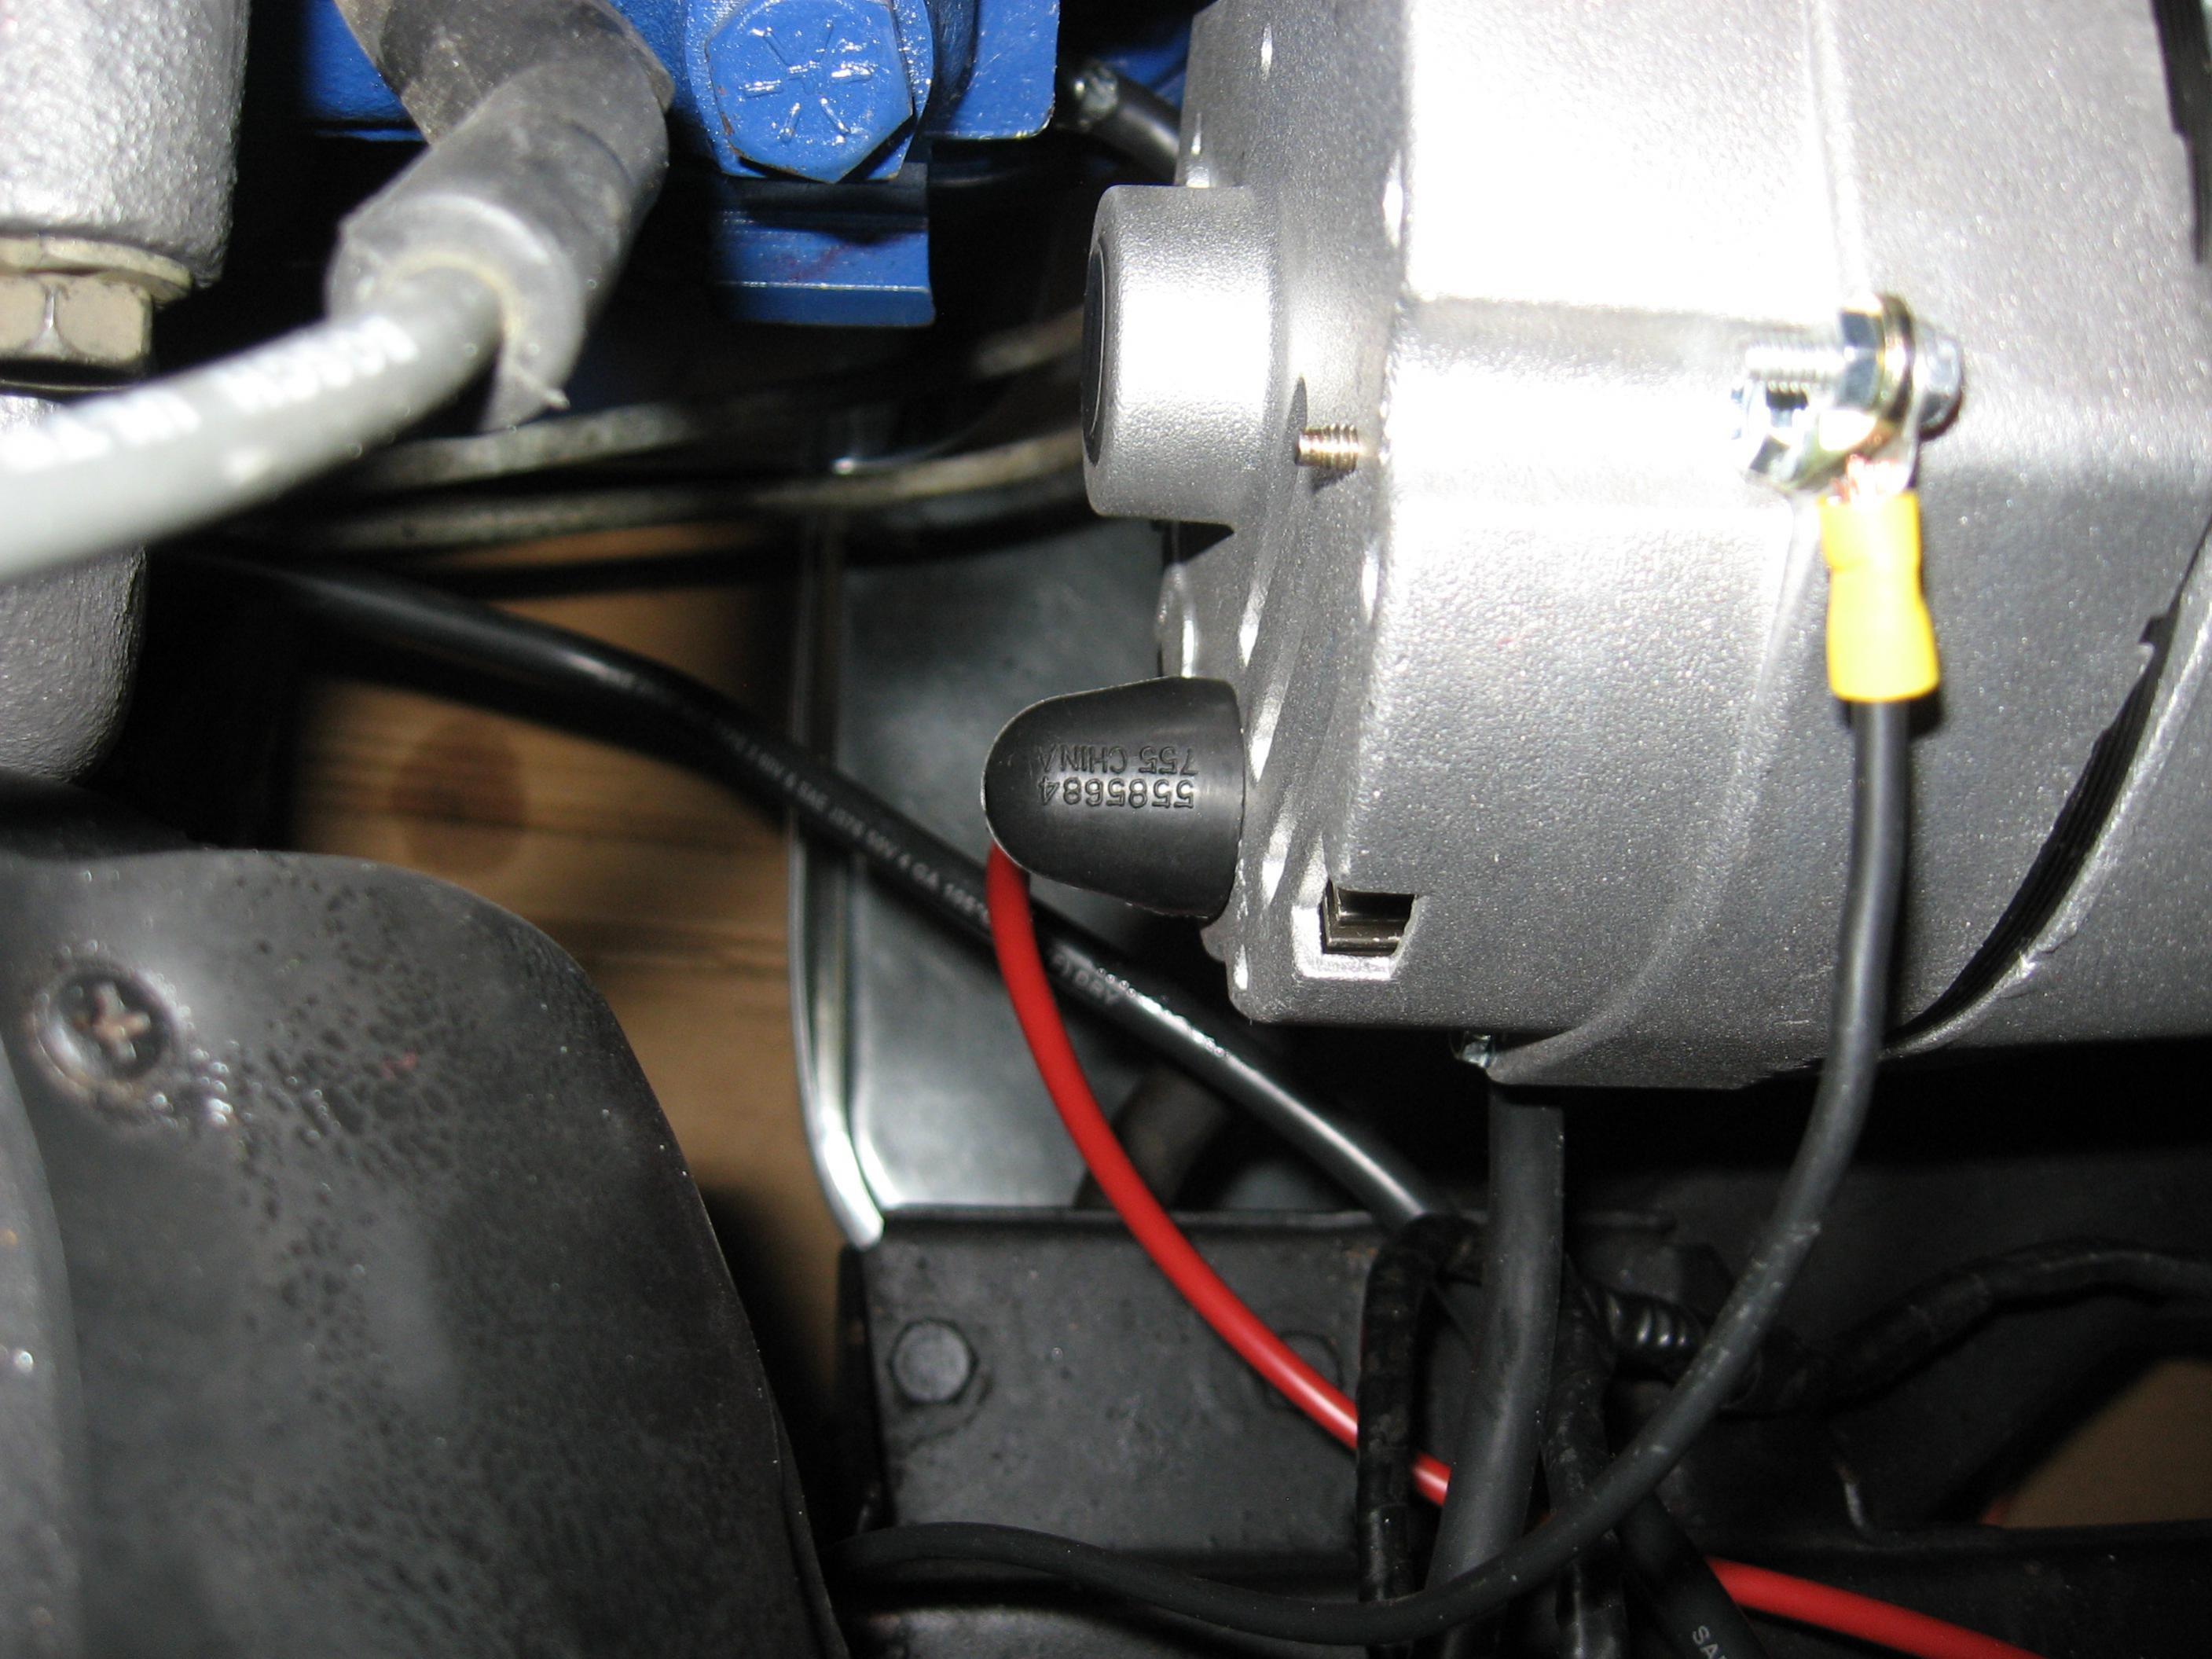 Tuff Stuff Alternator Wiring Diagram Library After Rotating Housing 002